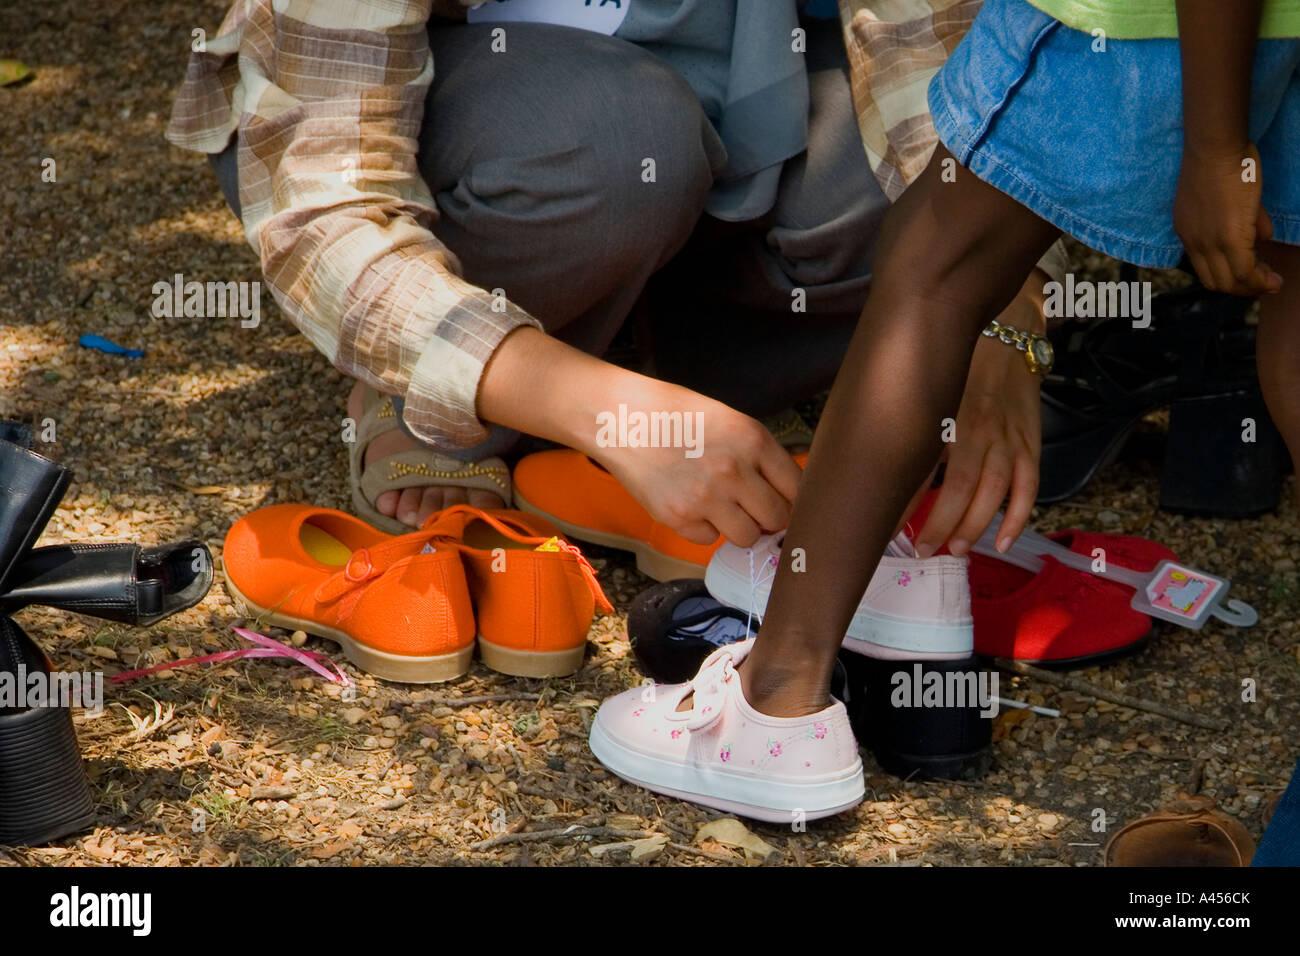 S'inscrit Féminine L'unicef ChaussuresDallas Volontaire Nigérienne rQCBWdxoe